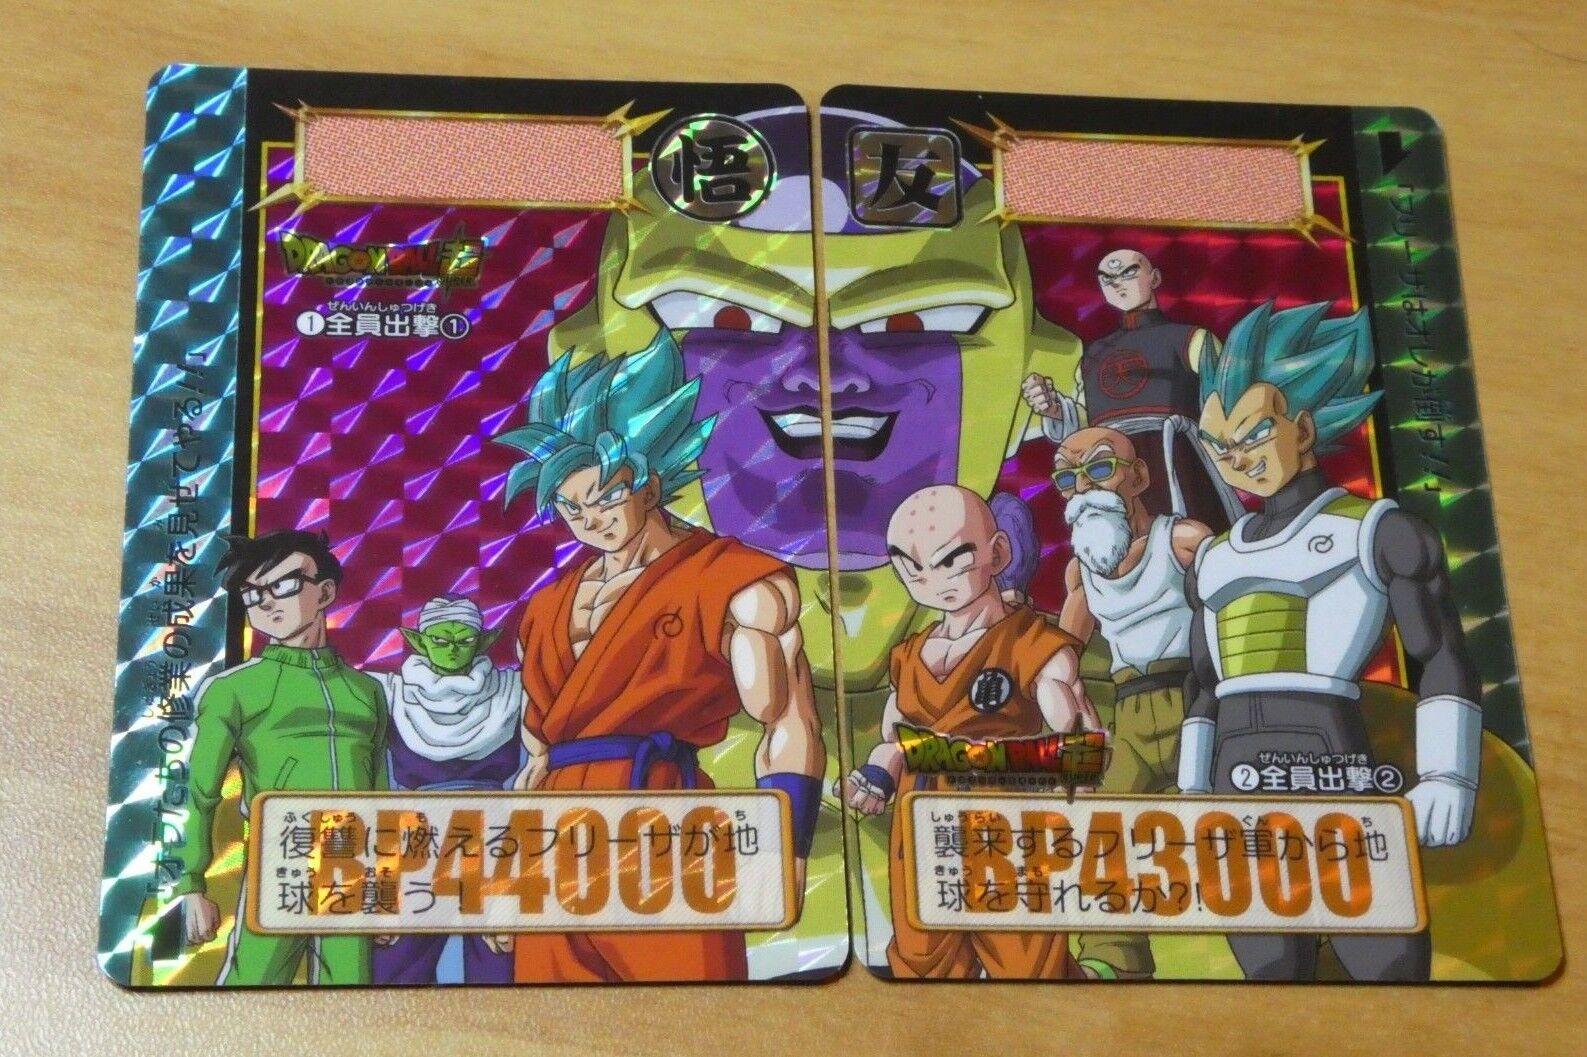 Dragon ball z gt dbz dbs hondan part 33 34 card puzzle prism card 1 & 2 japan m